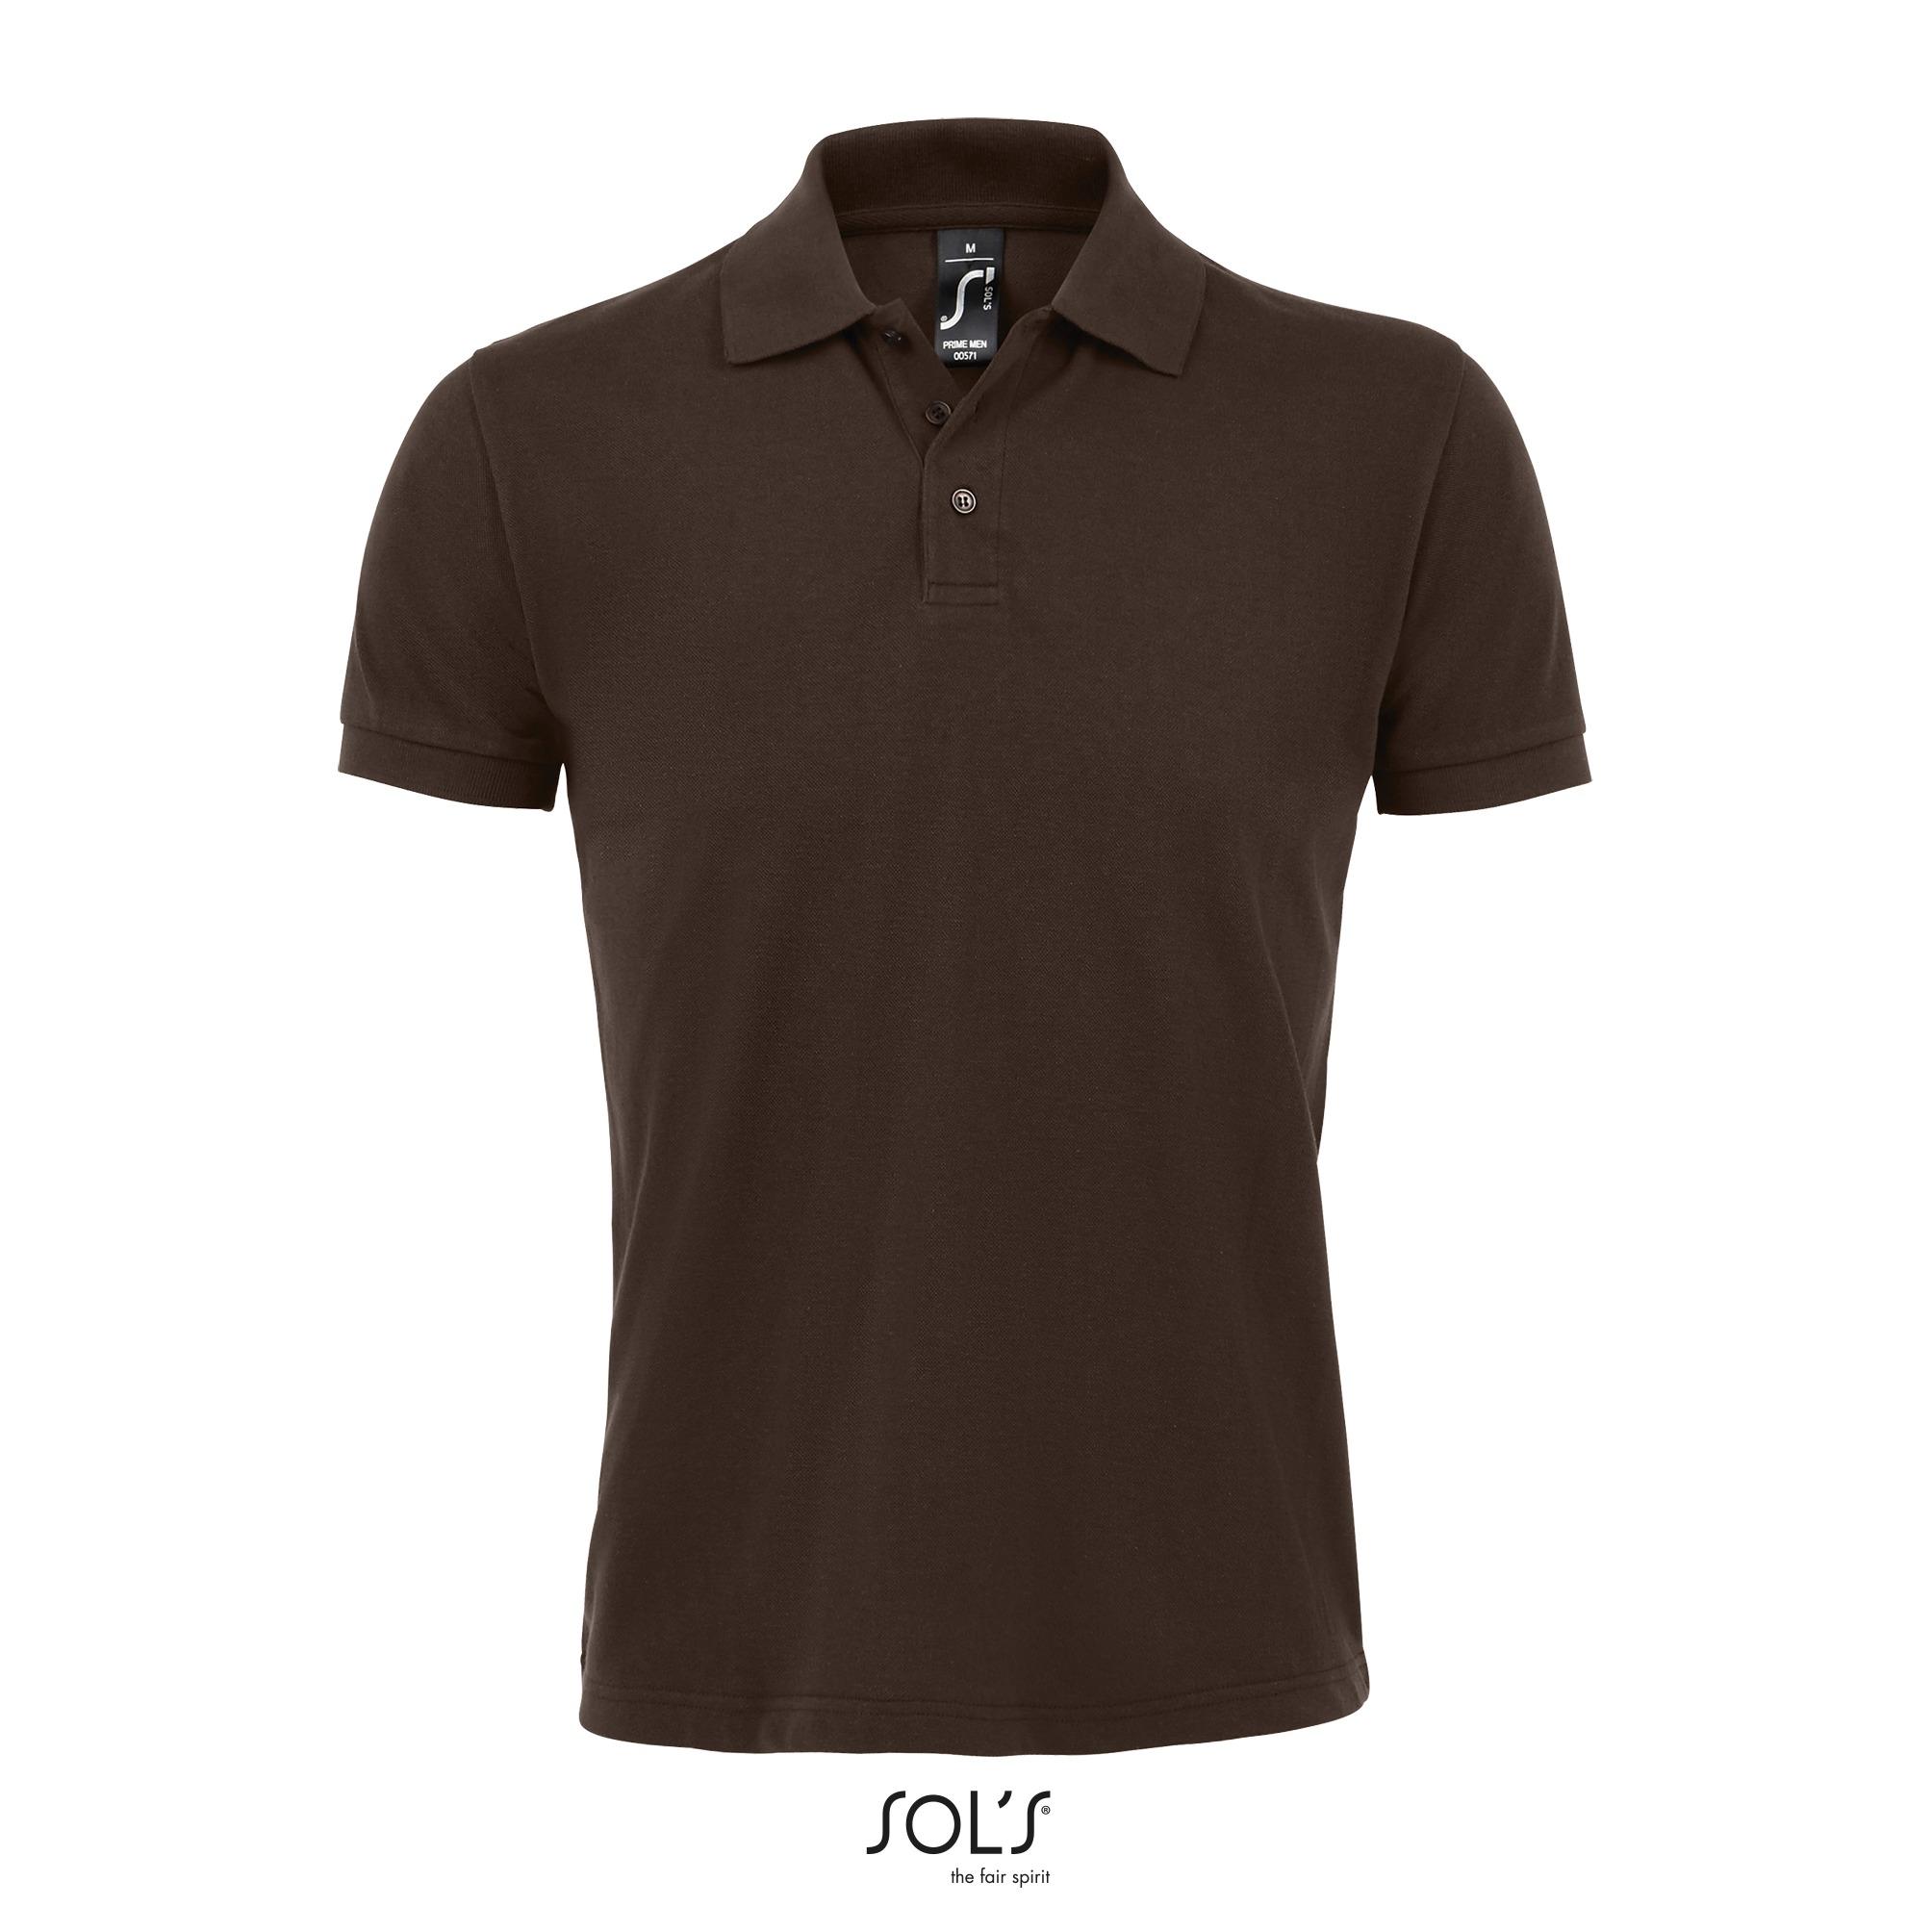 Polo homme - 1-1044-24